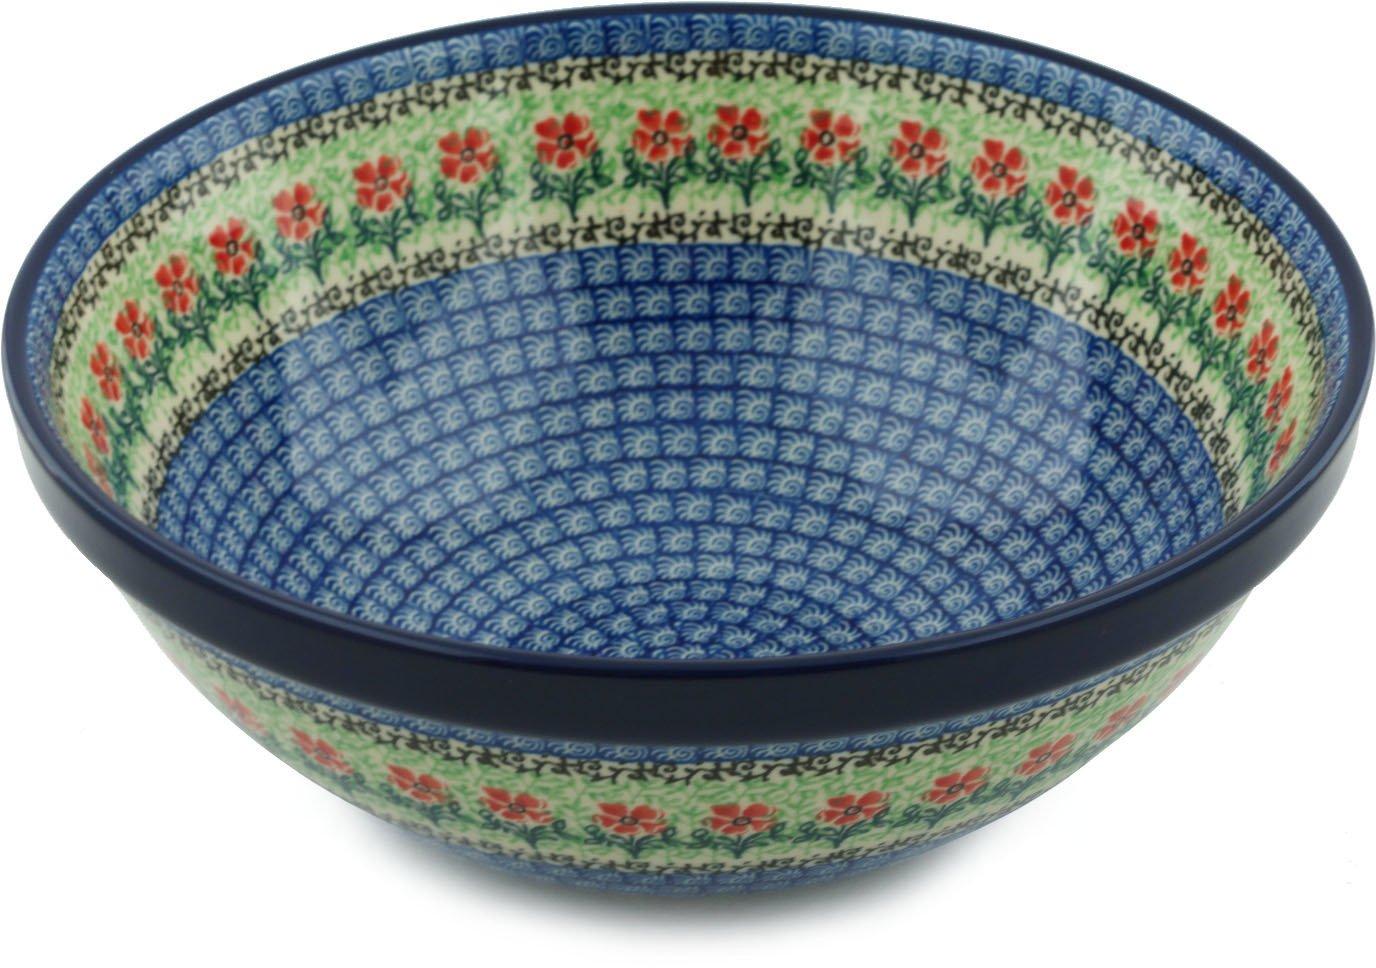 Polish Pottery Bowl 11-inch Maraschino made by Ceramika Artystyczna by Polmedia Polish Pottery